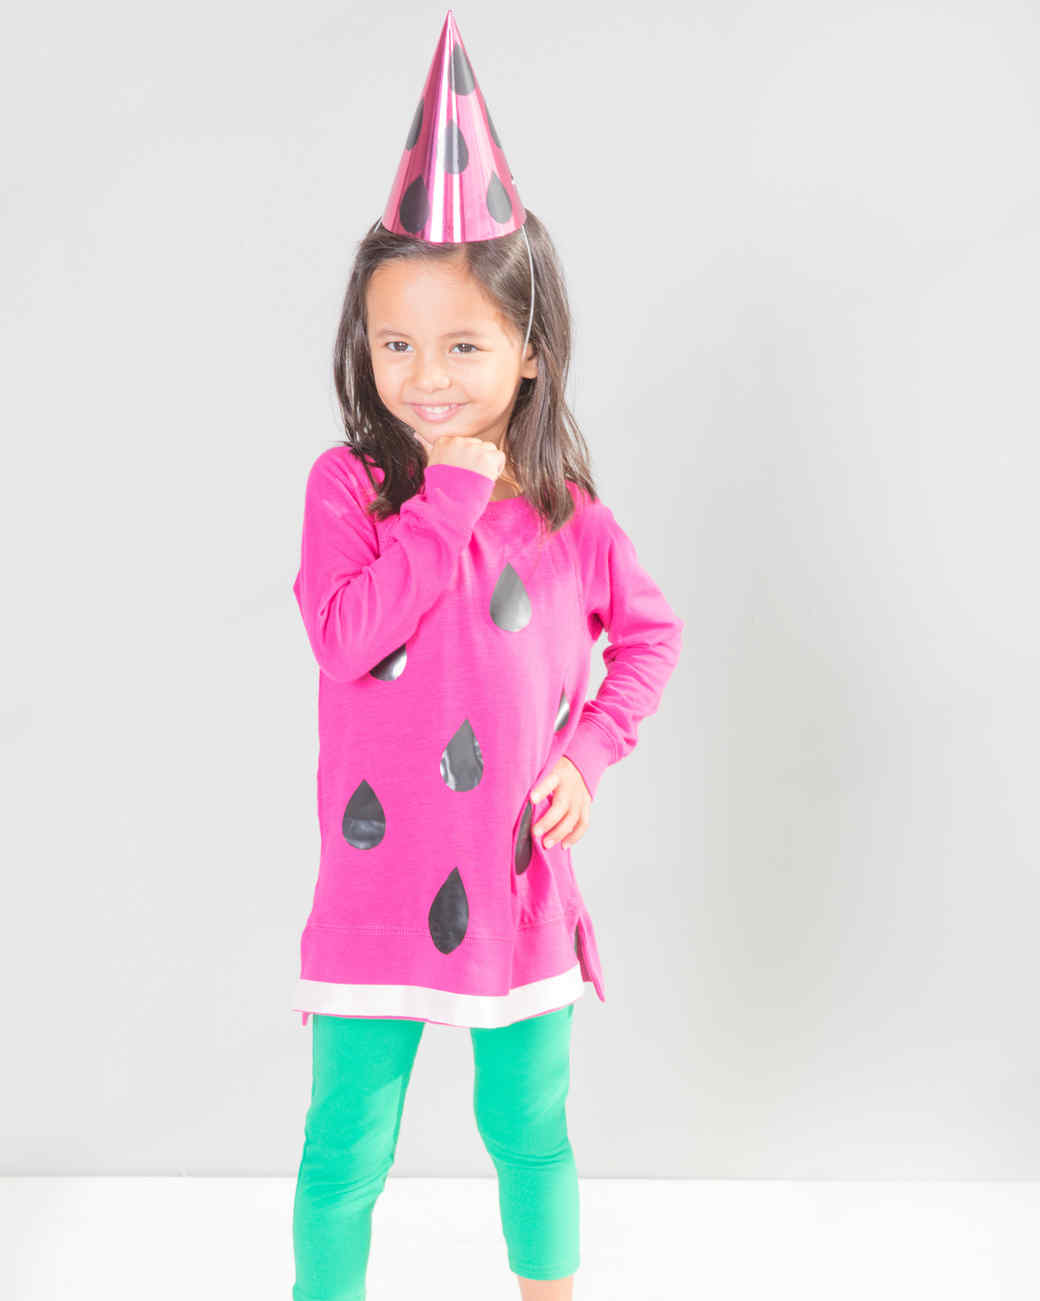 Watermelon Dress Costume